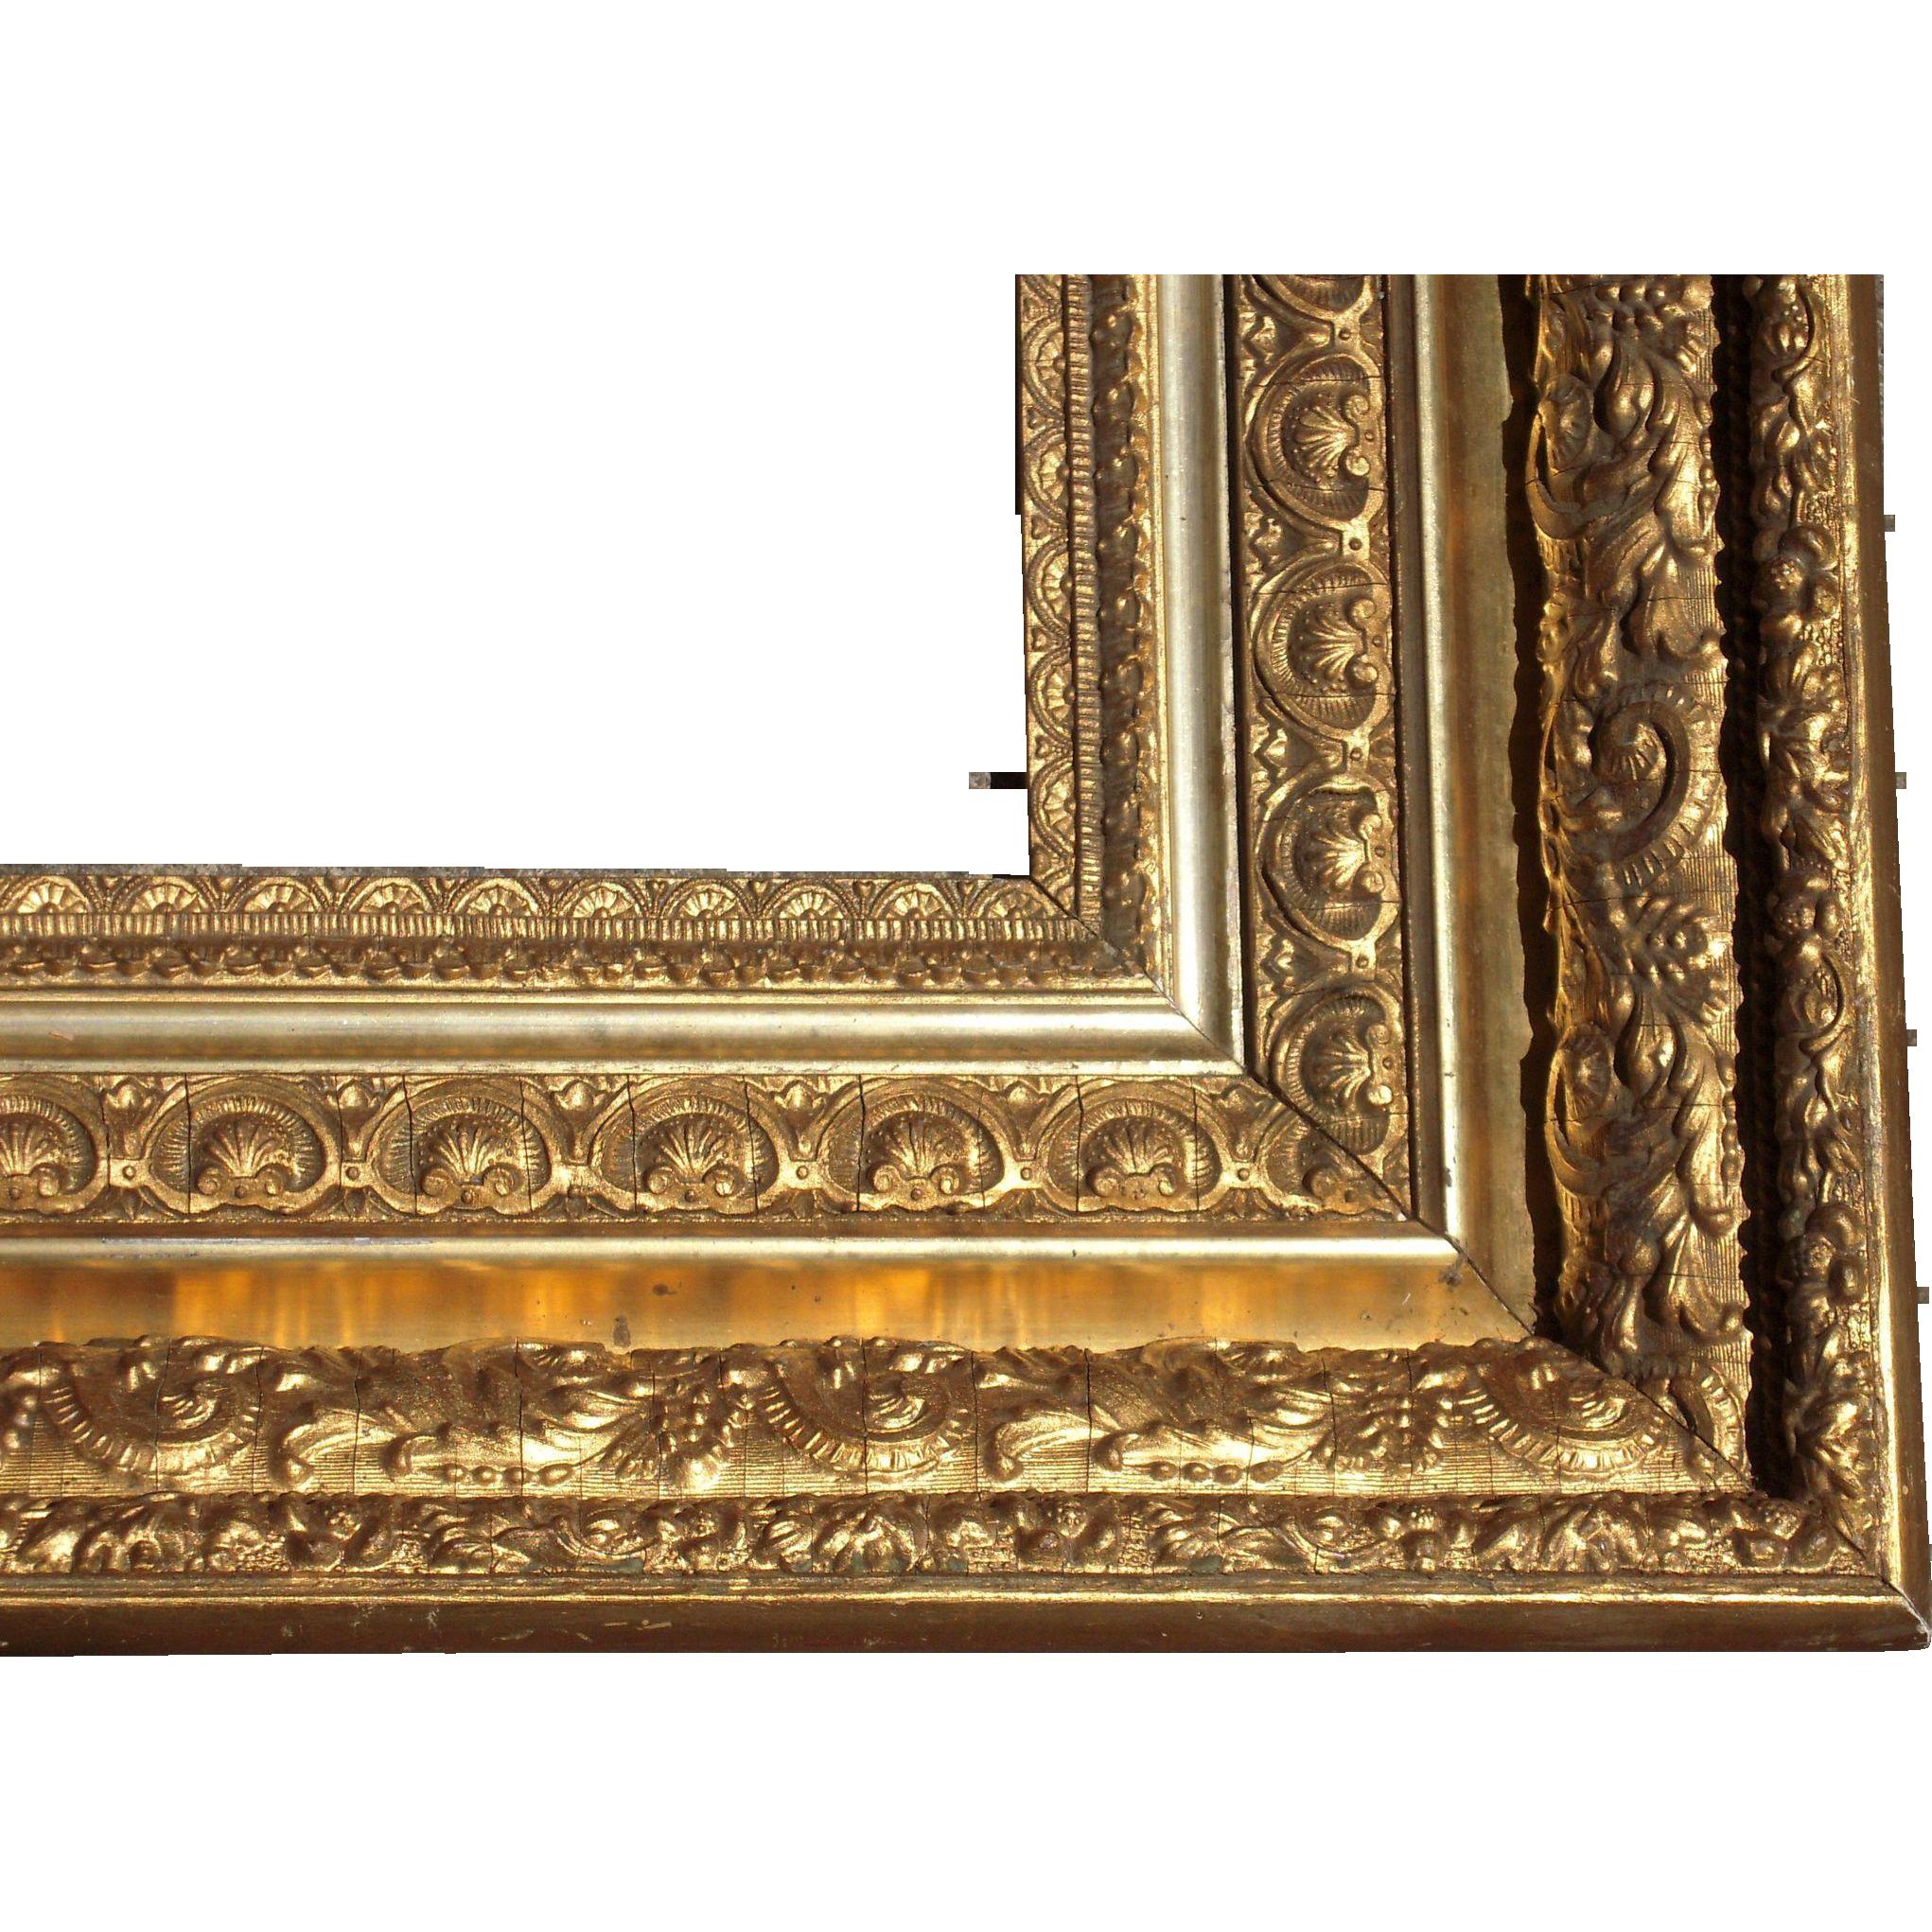 Large antique ornate victorian gold picture frame 20 x 24 1 large antique ornate victorian gold picture frame 20 x 24 1 jeuxipadfo Choice Image